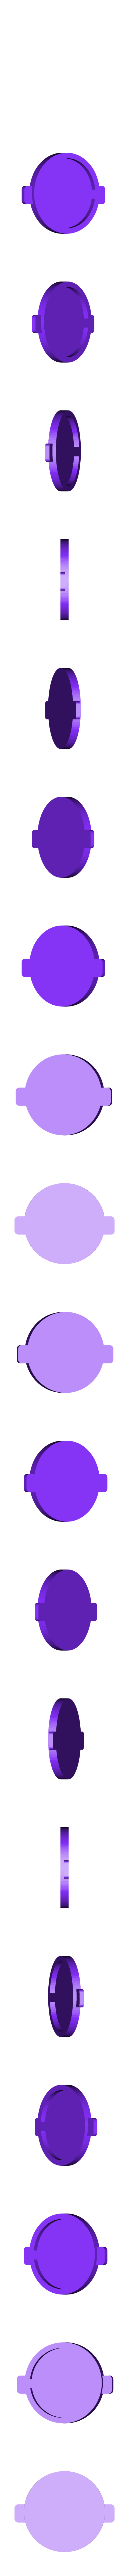 tapamon.stl Download STL file Soccer Ball Money Box • Object to 3D print, manrod3d